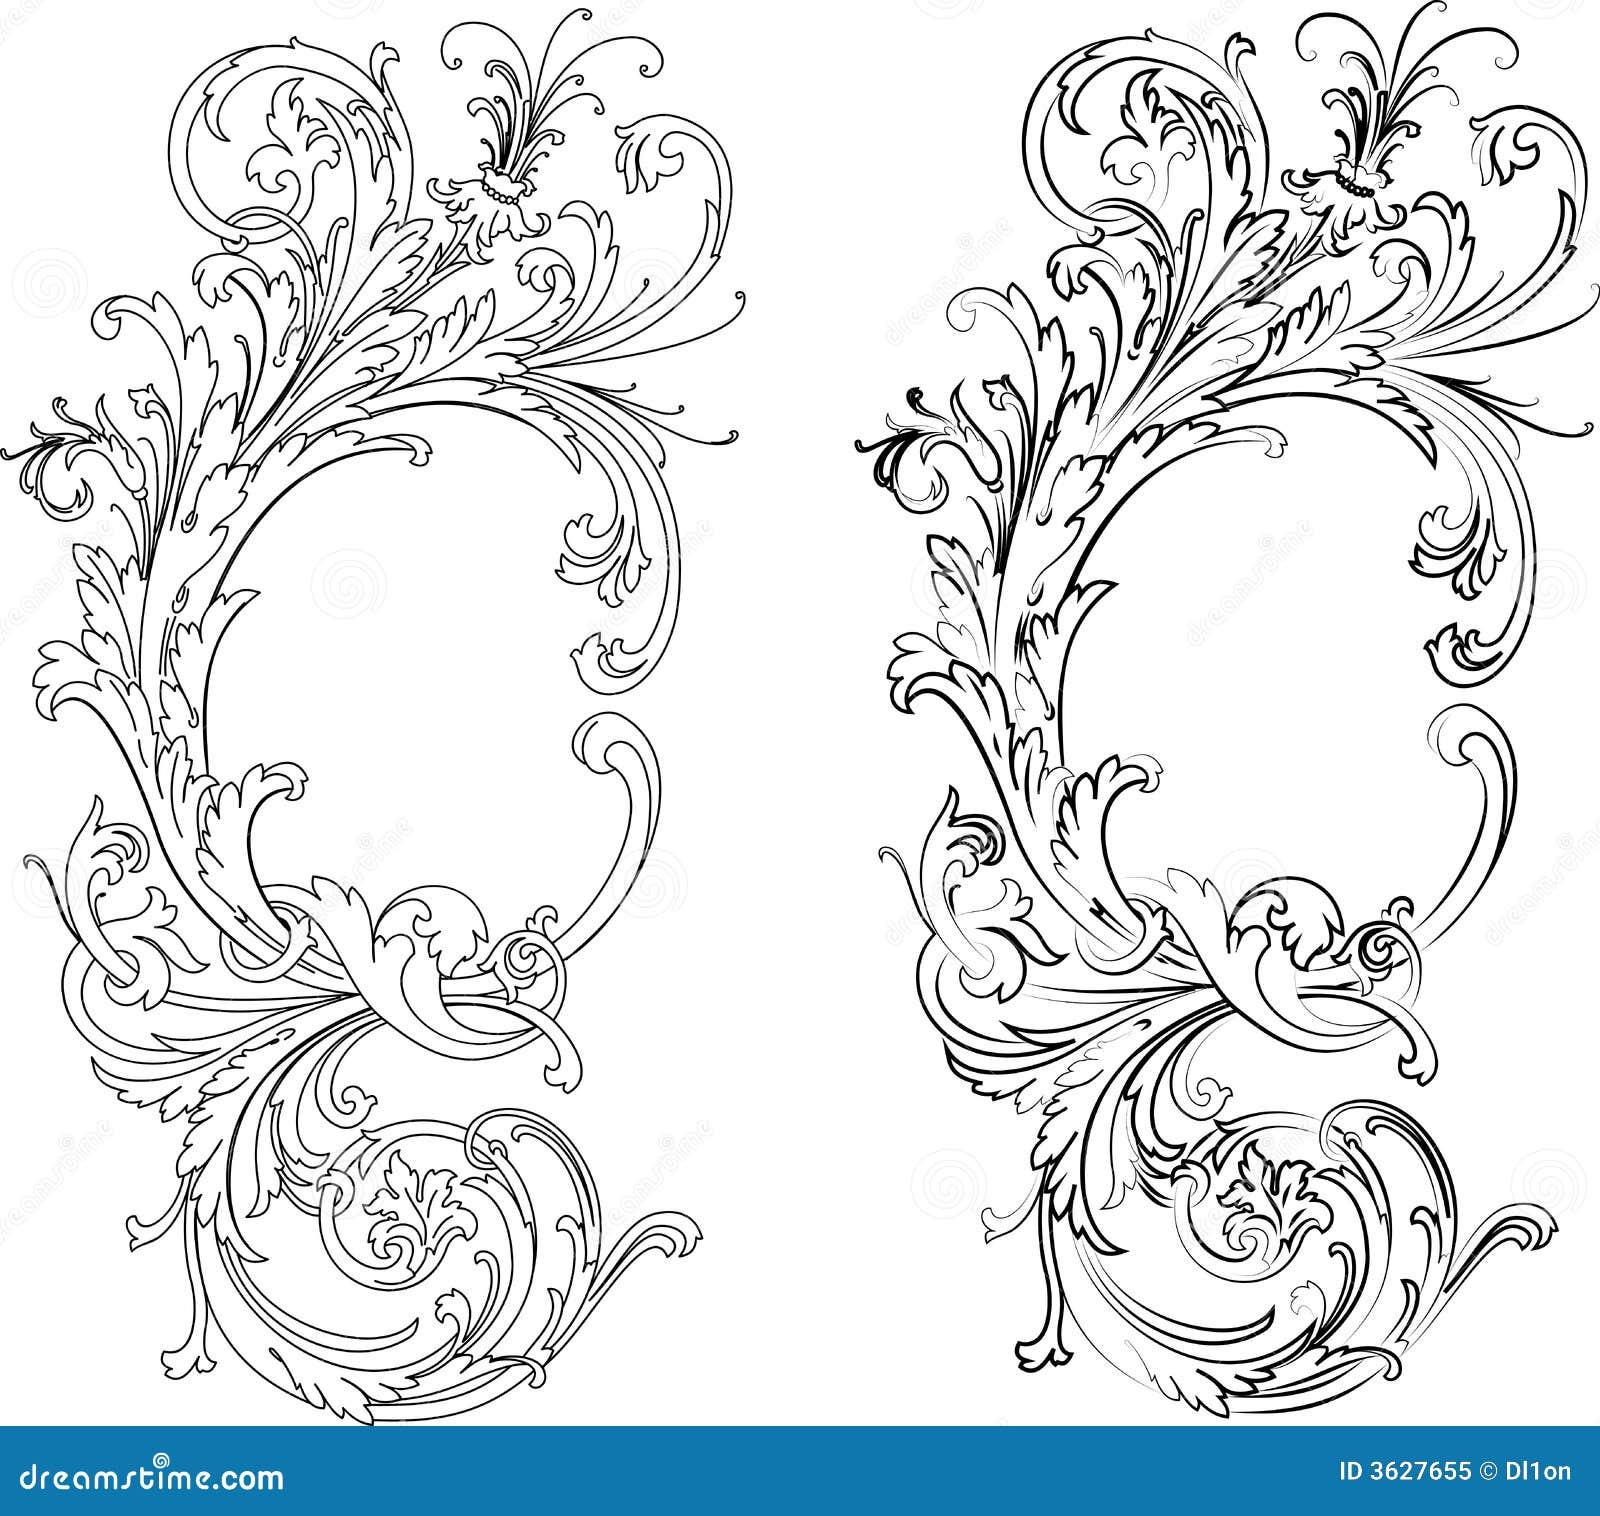 Den barocka calligraphyen styles traditionella två